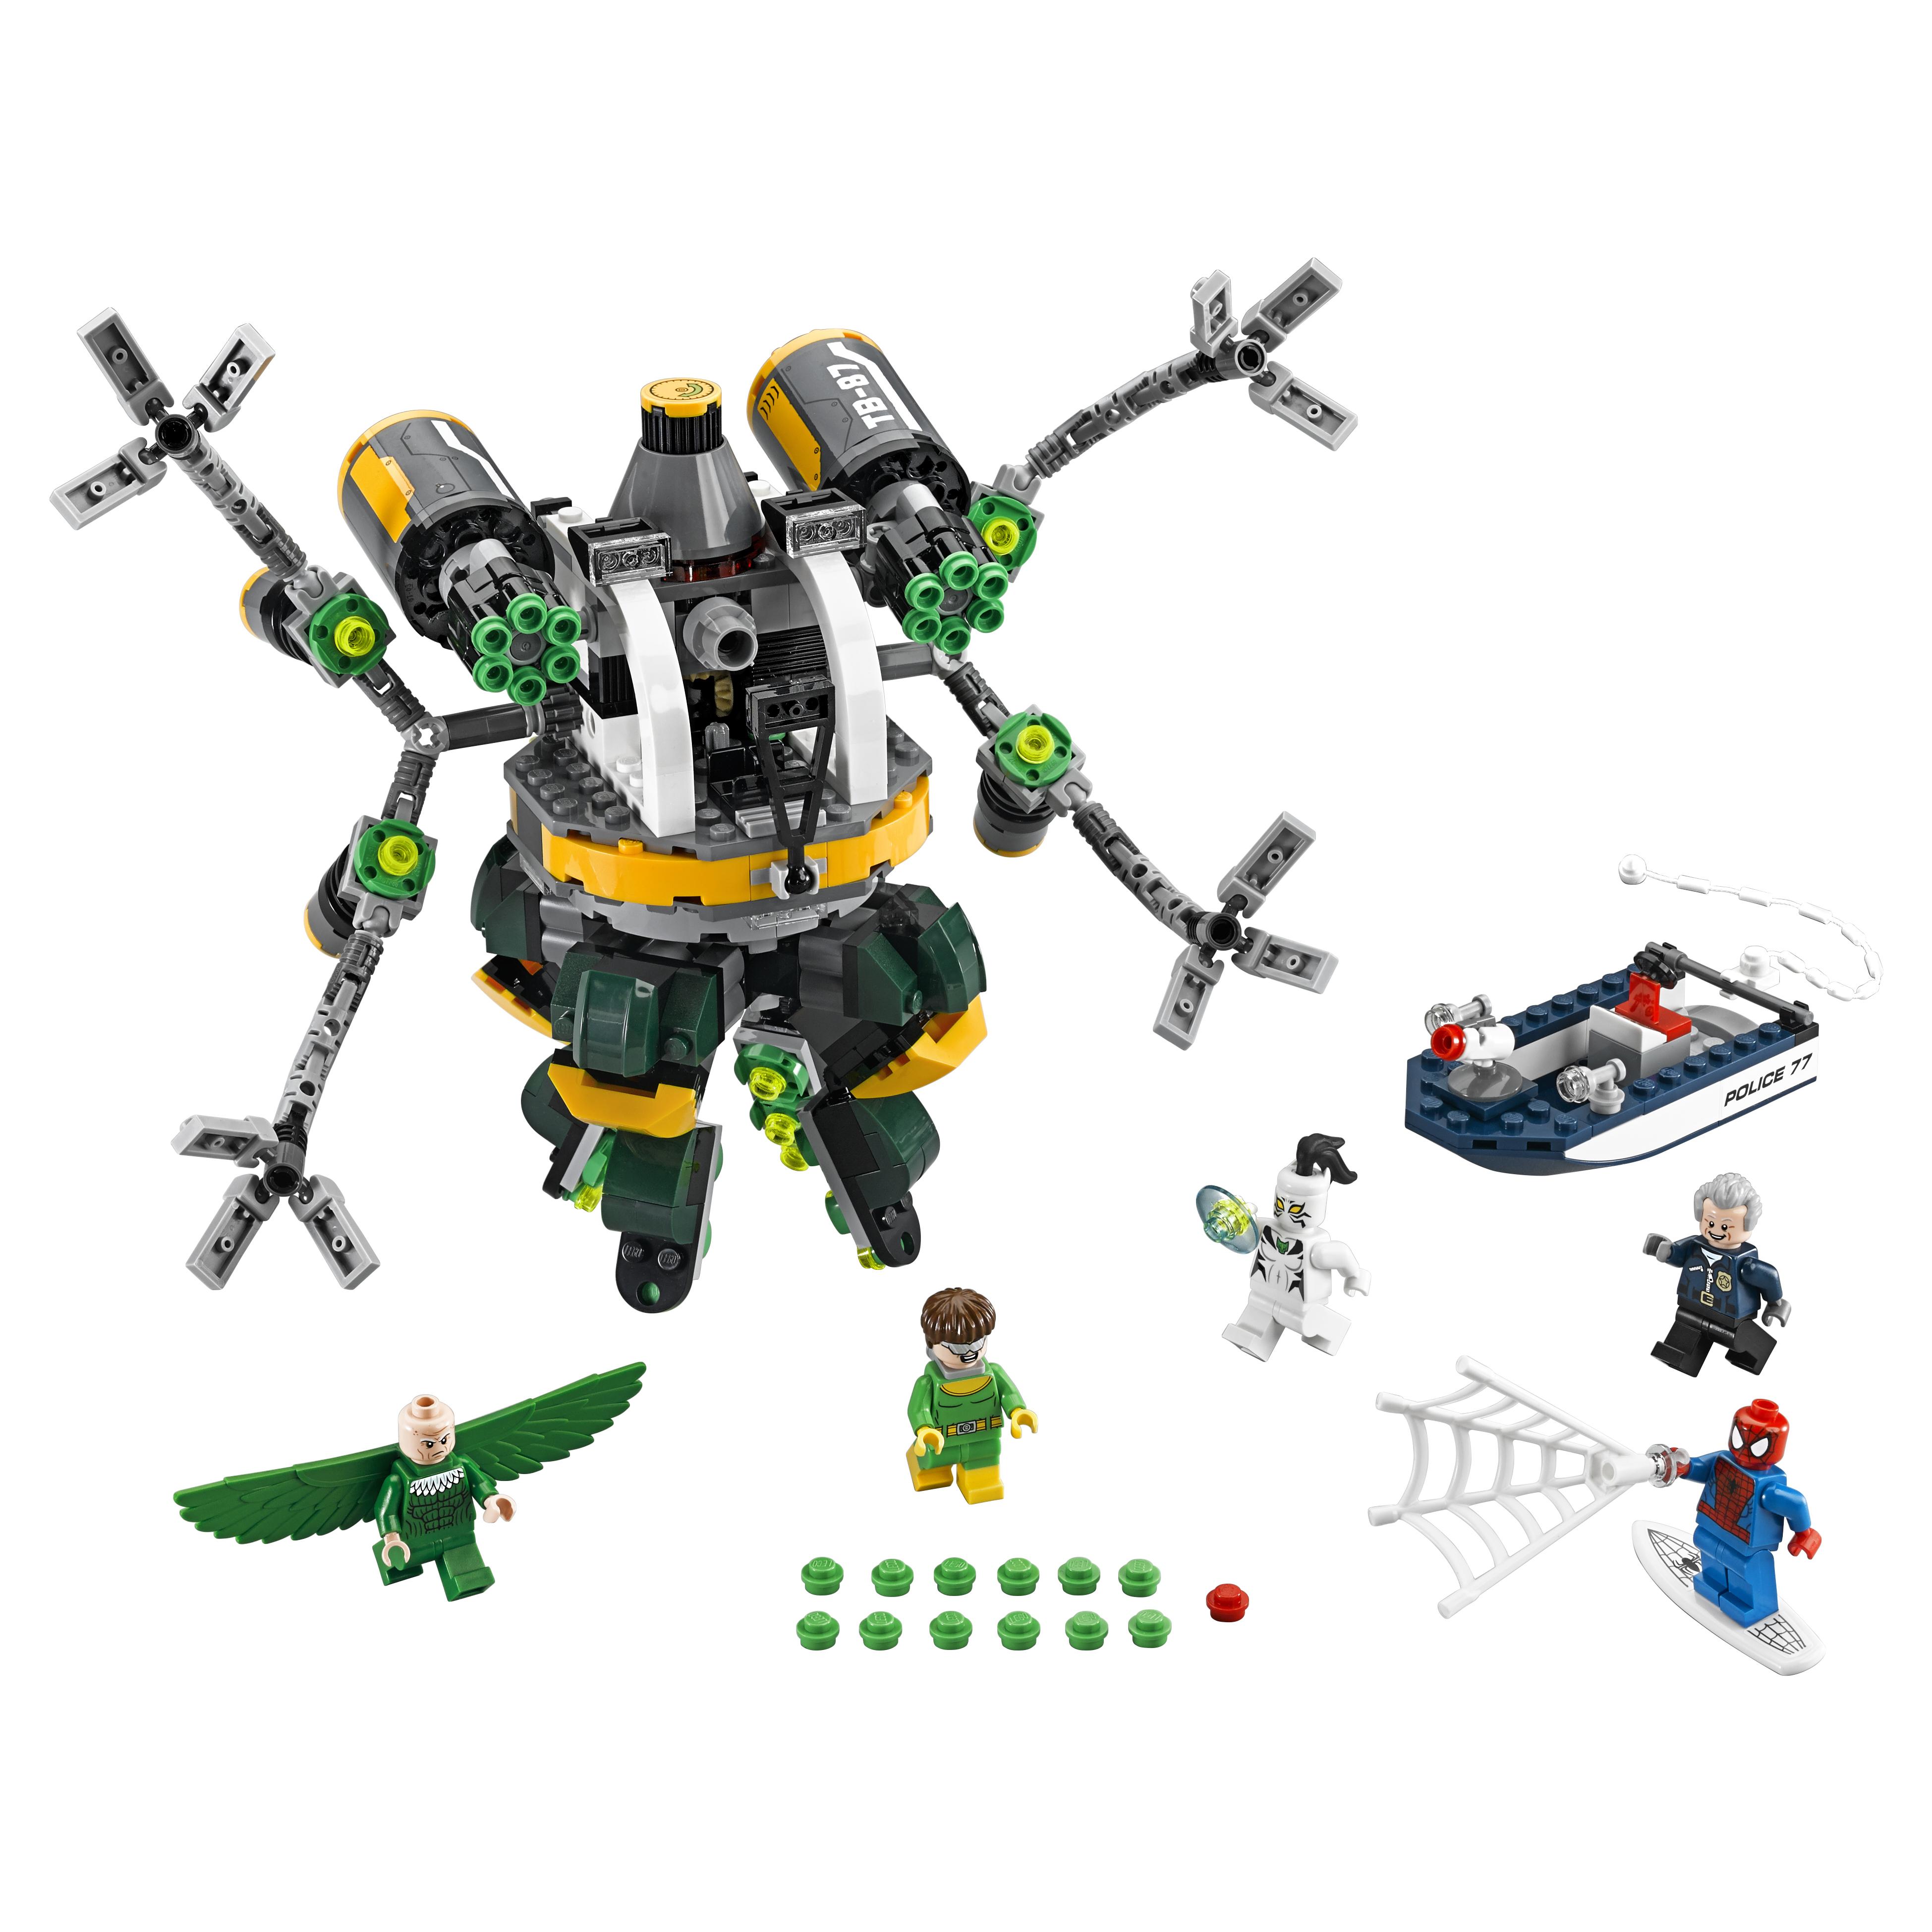 Конструктор LEGO Super Heroes Человек паук: